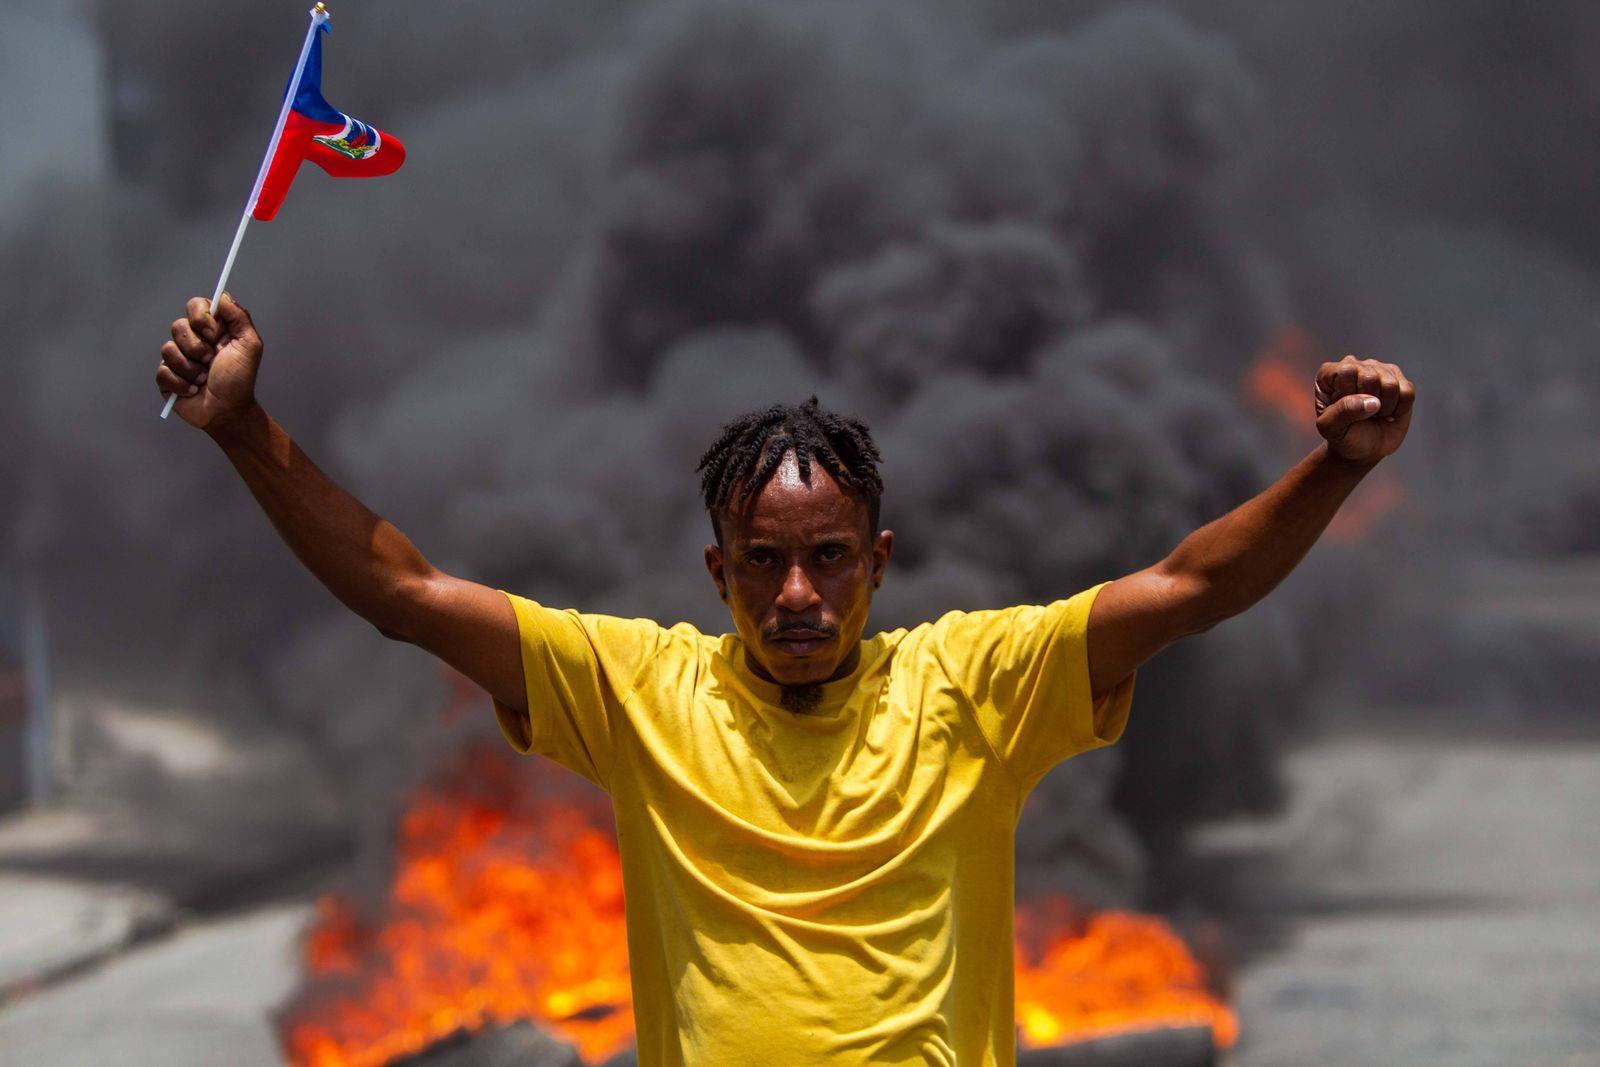 News Bilder des Tages Demonsrators protest amid the celebration of the National Flag Day, in Port-au-Prince, Haiti, 18 M